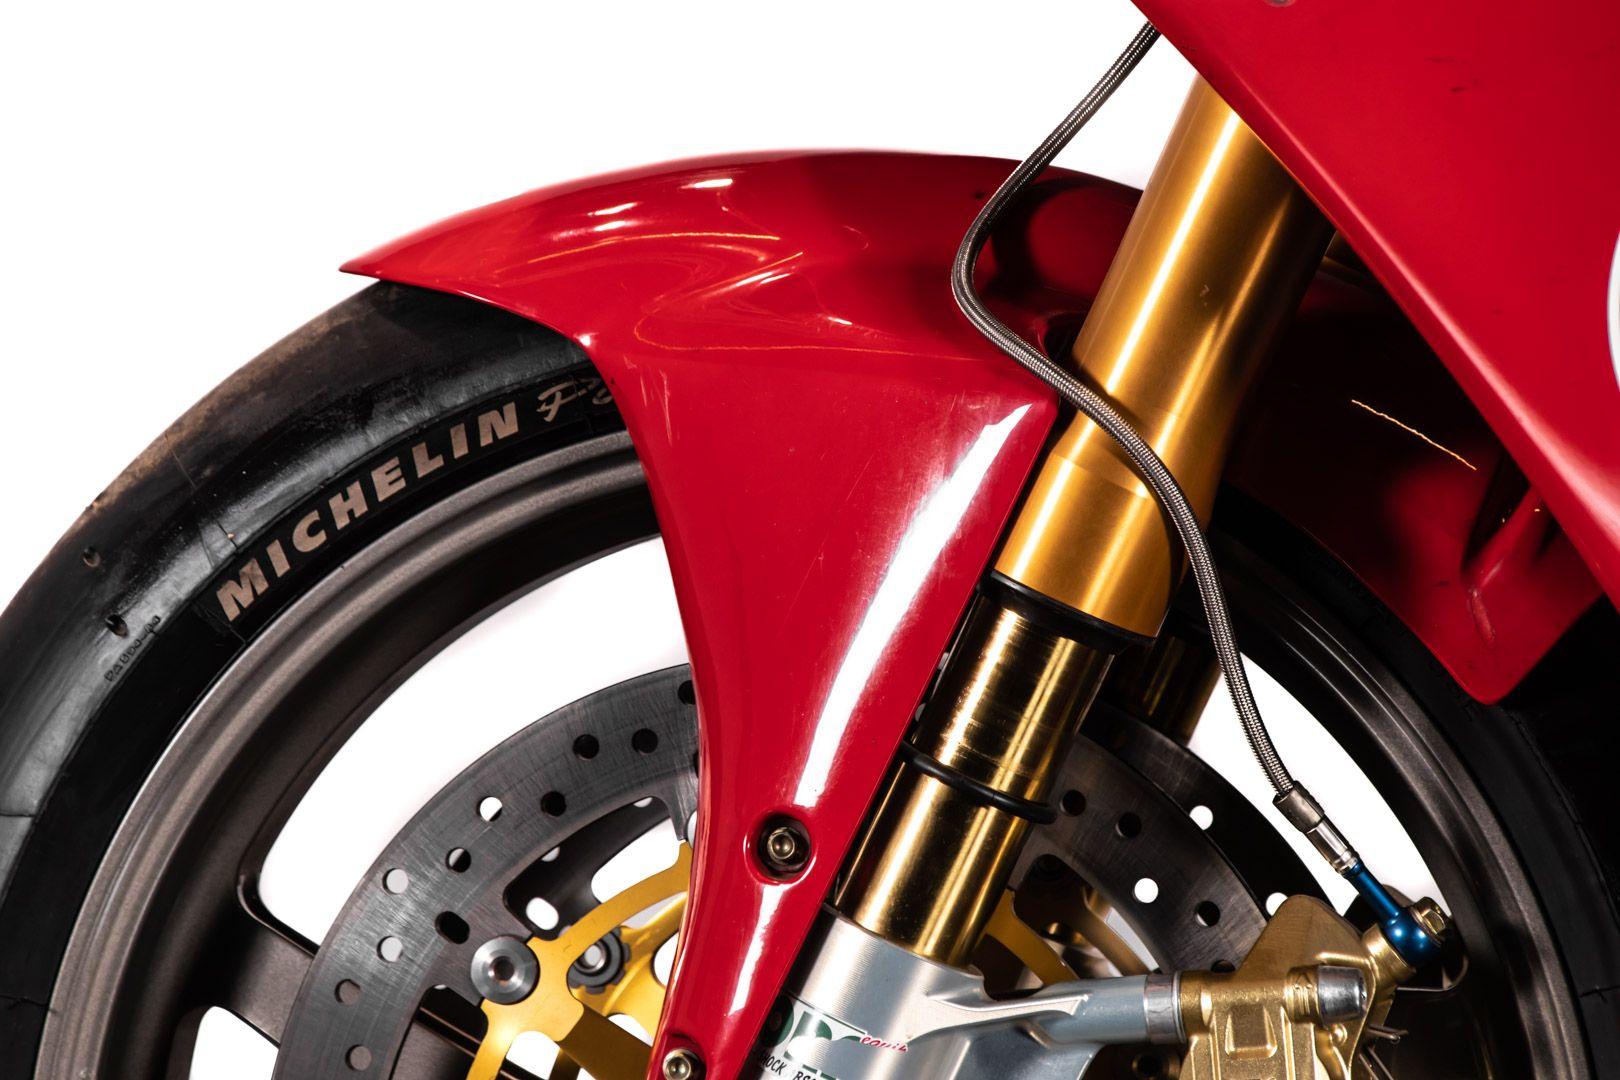 2008 Ducati 996 Fogarty Evocation 03/12 84212